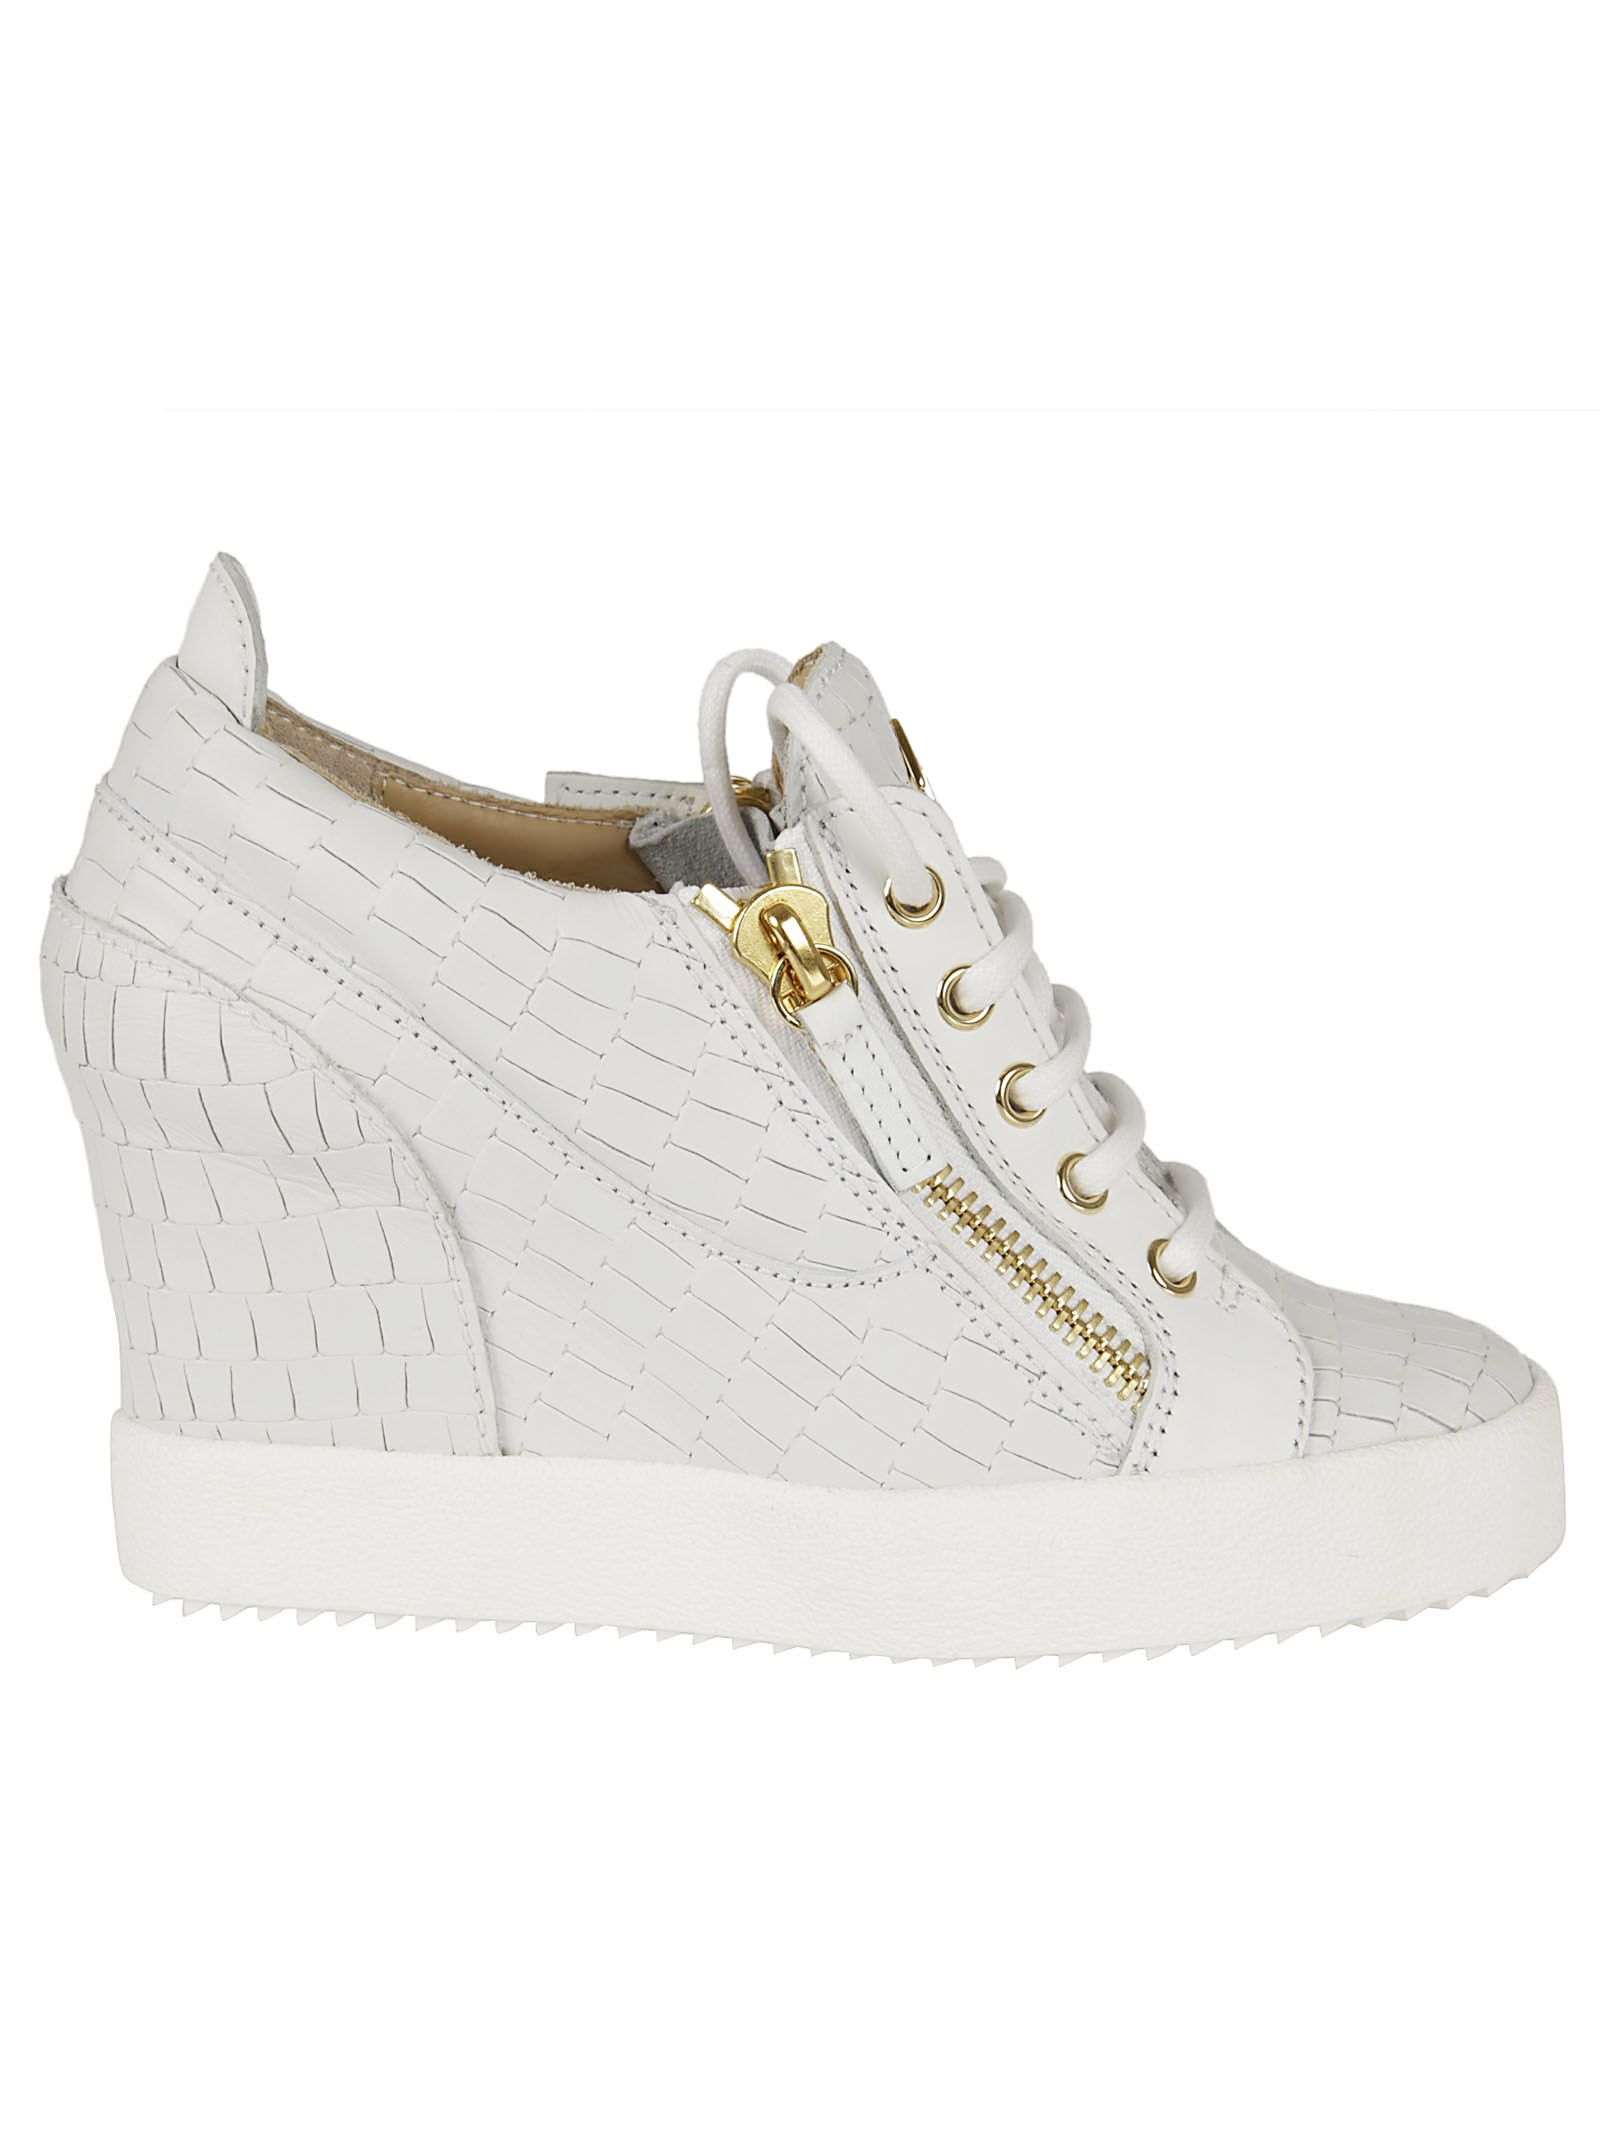 giuseppe zanotti female giuseppe zanotti crocodile effect hitop wedge sneakers